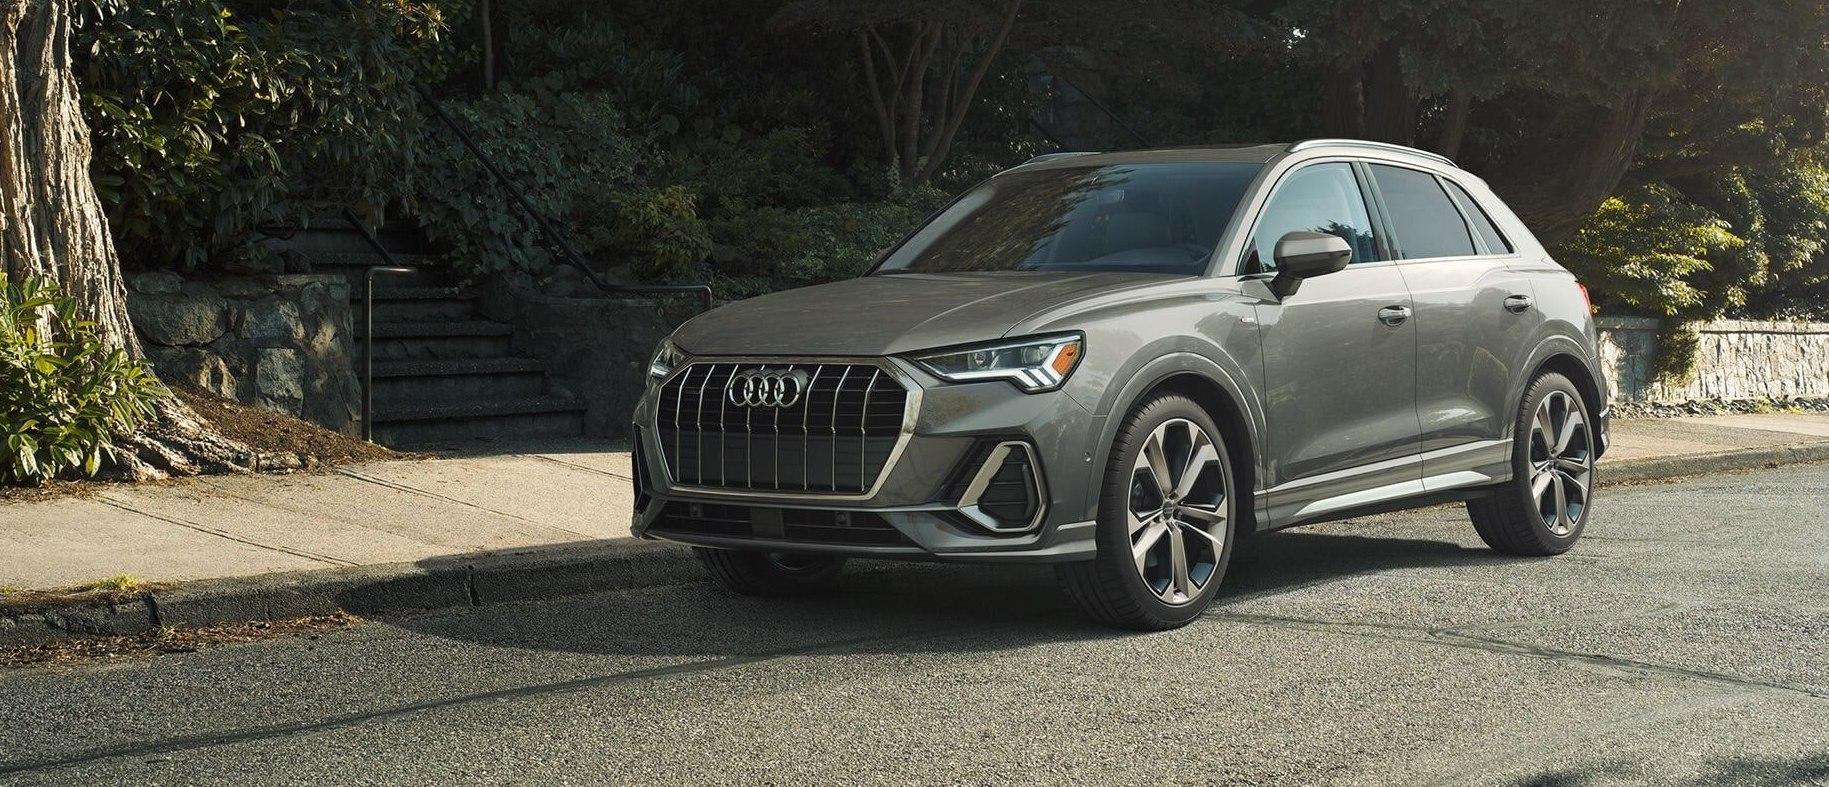 2021 Audi Q3 Lease Near Long Island Ny